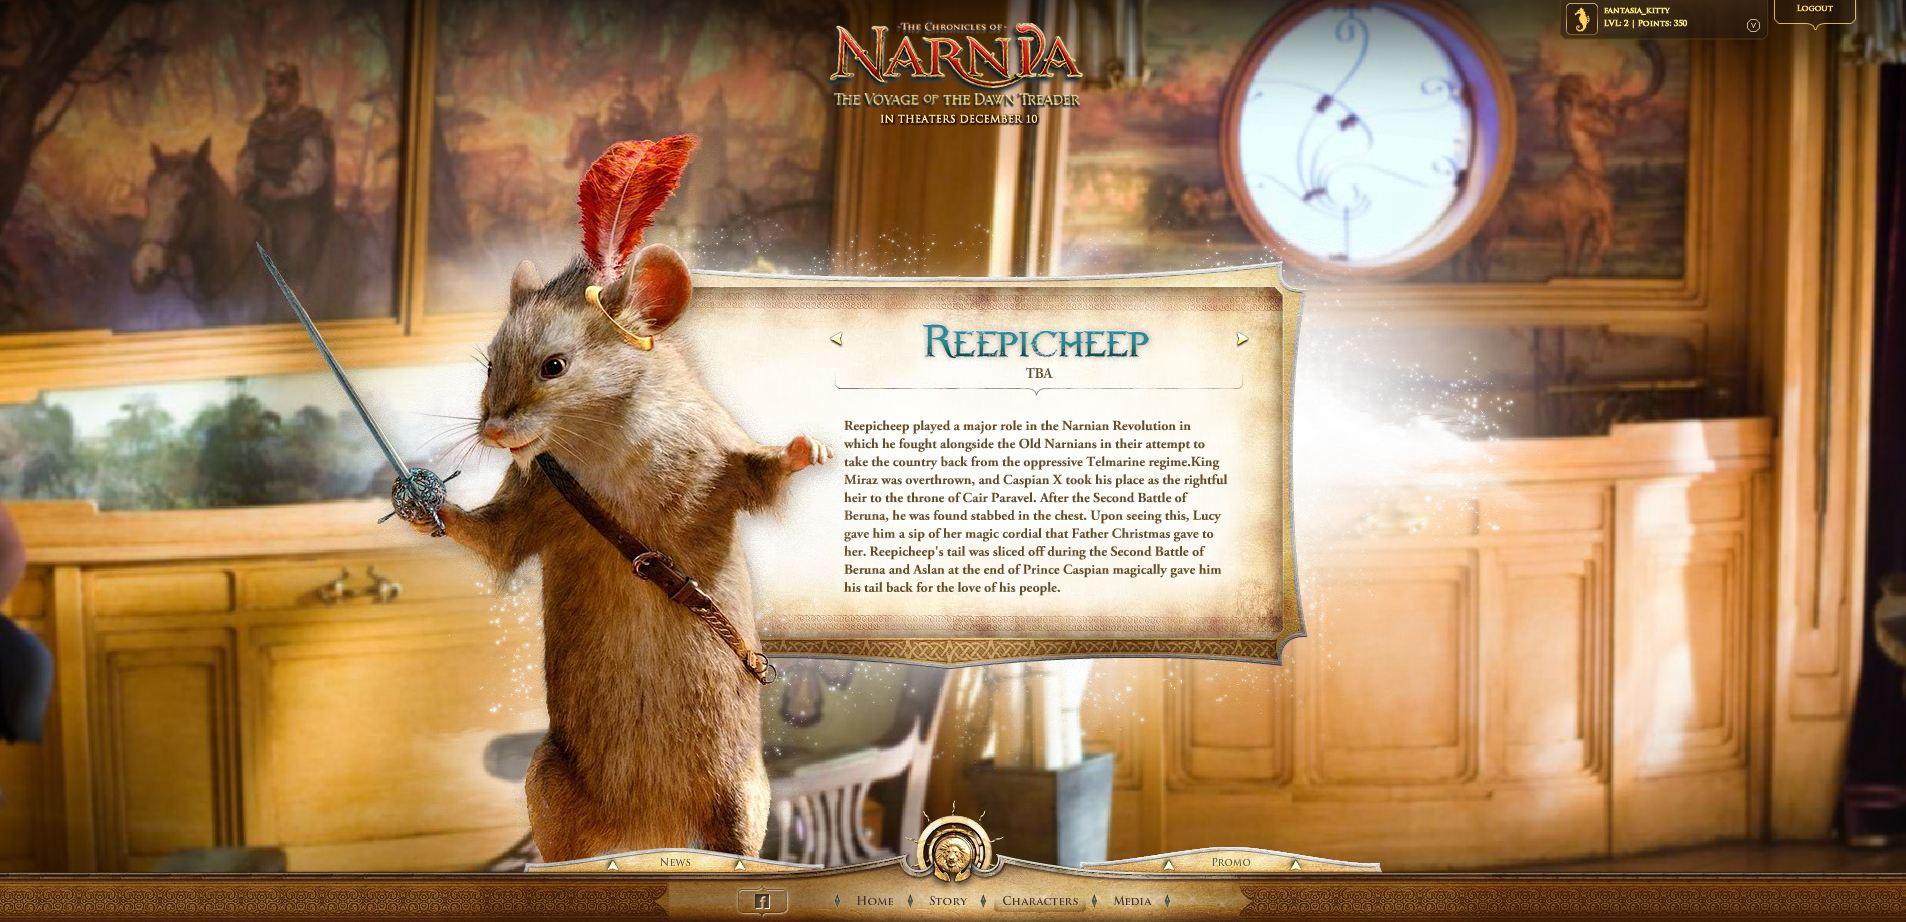 Narnia.com Screenshots | NarniaWeb